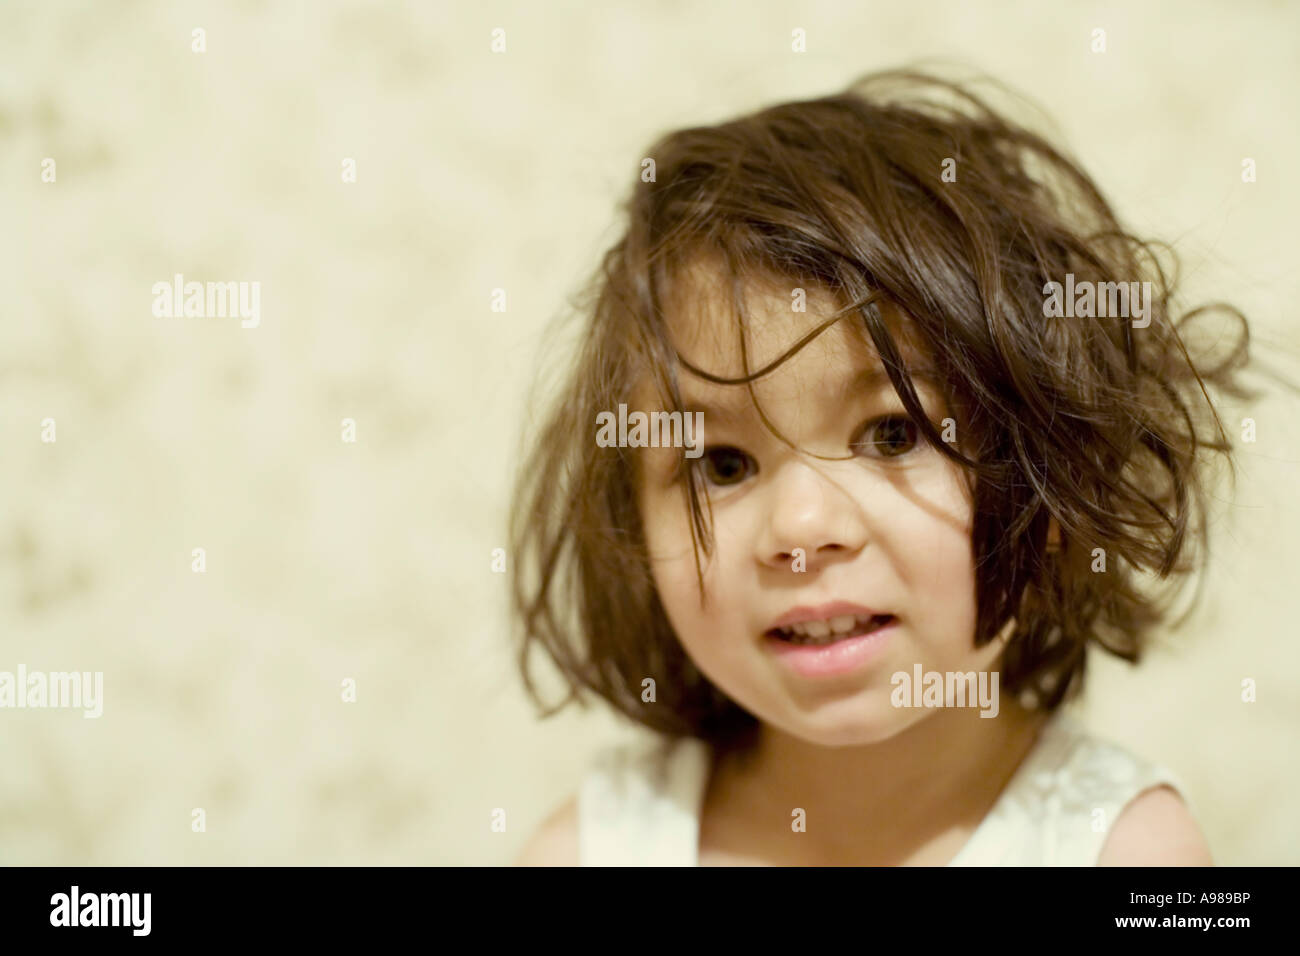 Girl awakens with messy hair - Stock Image